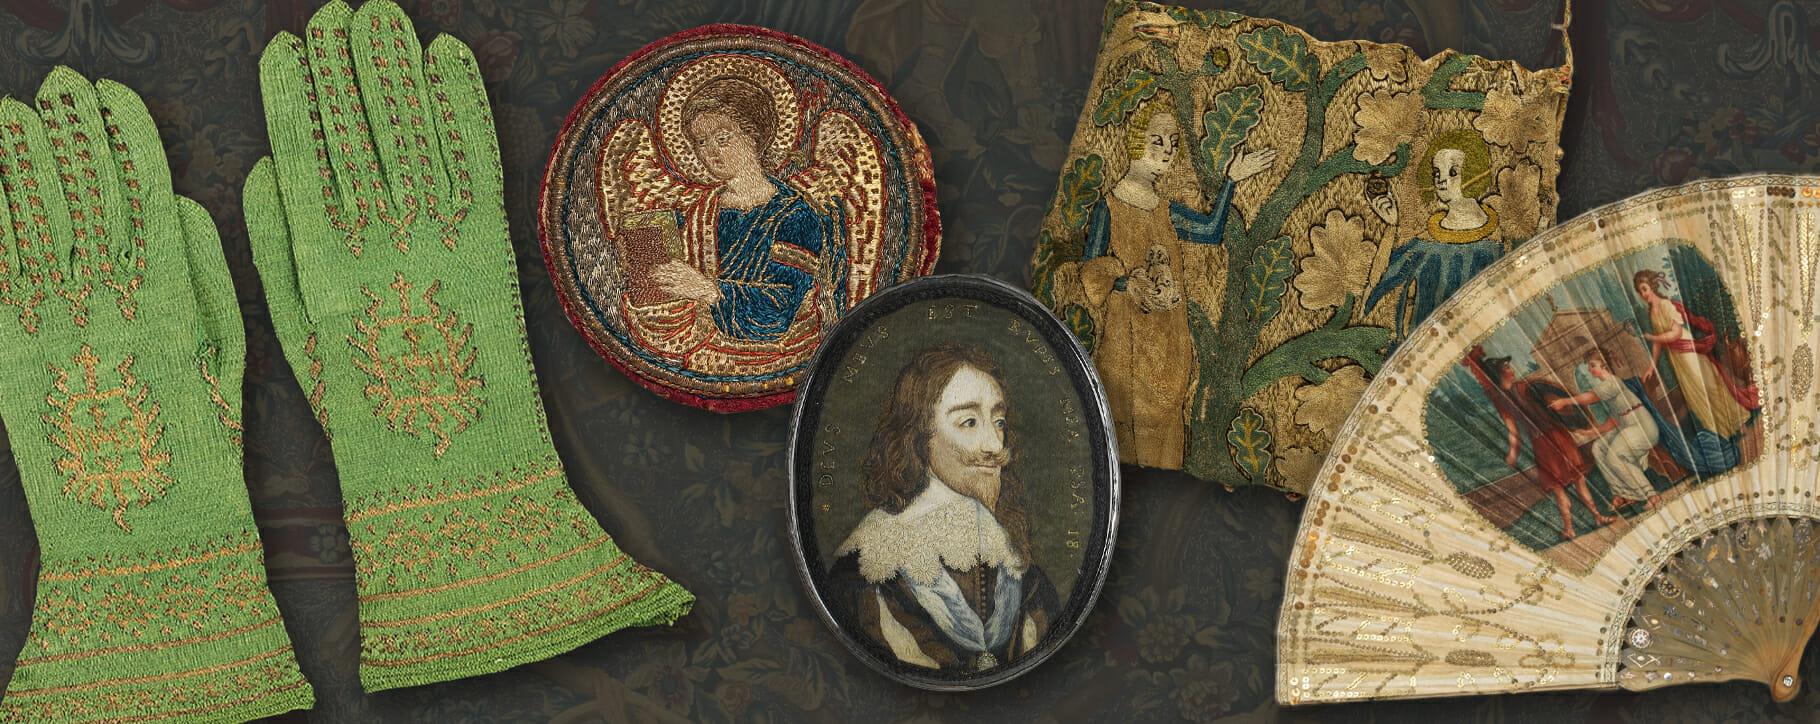 Antique Textile Examples